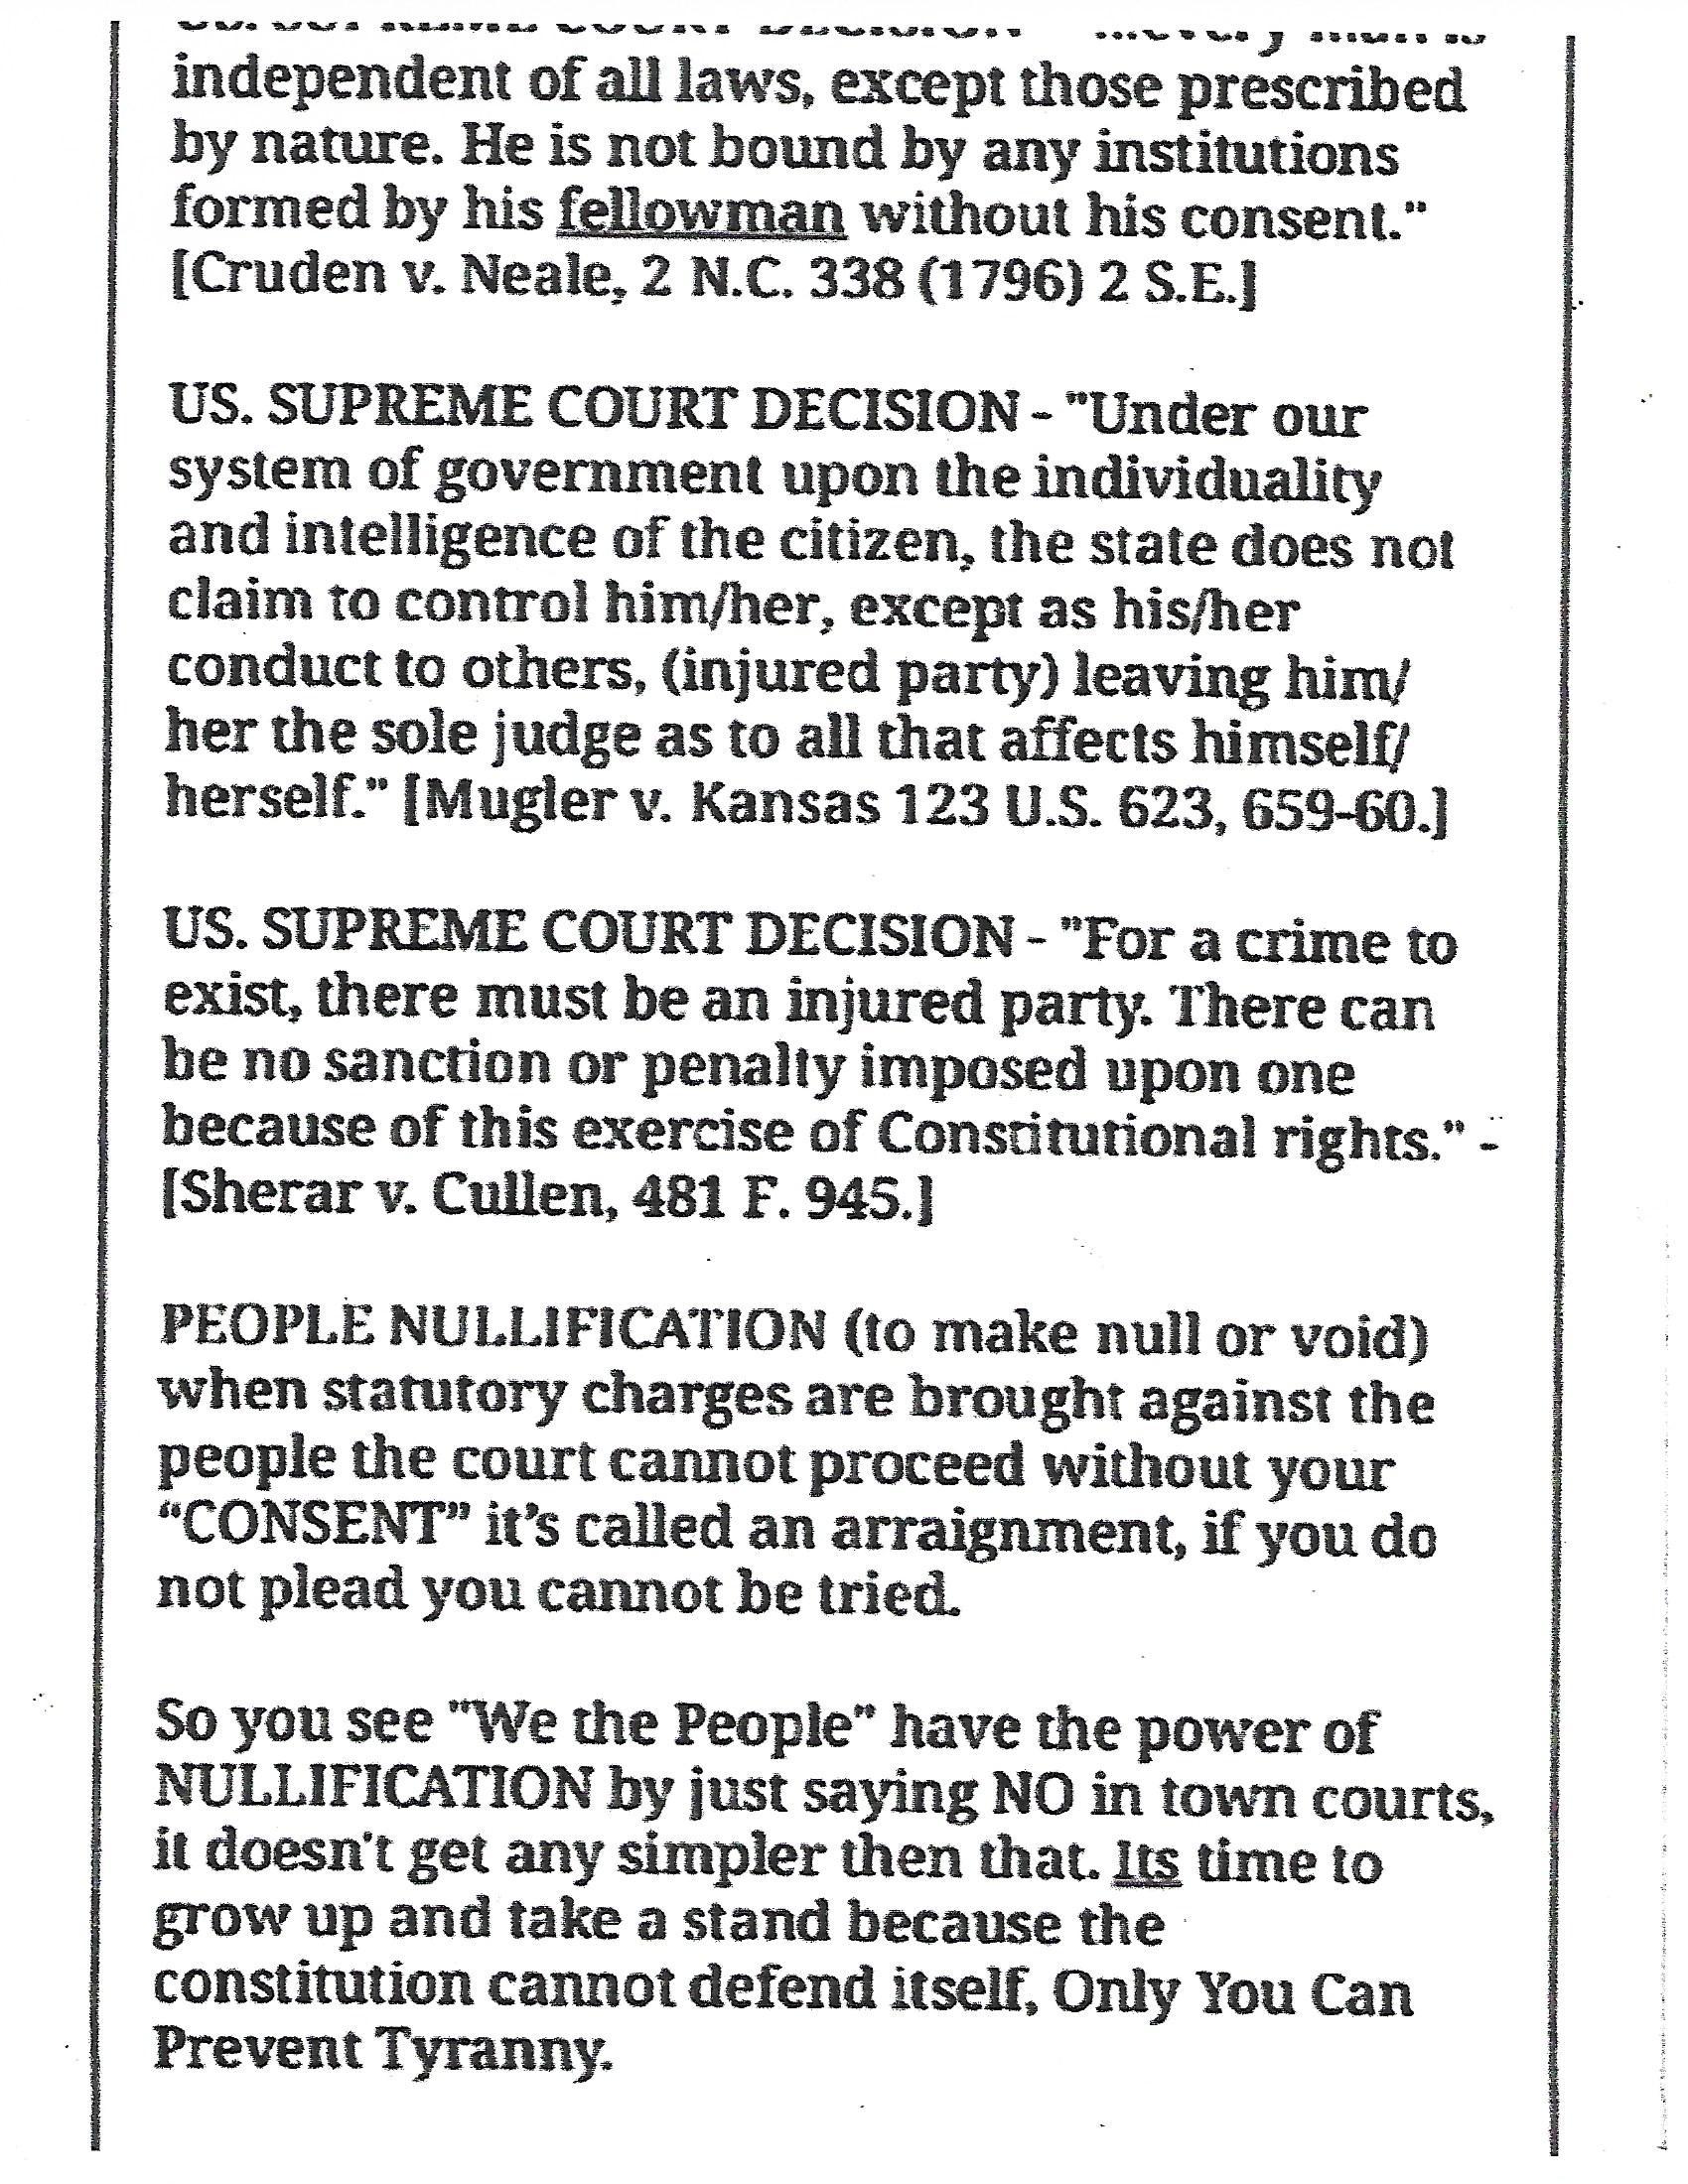 Freedom Supreme Court Case Law